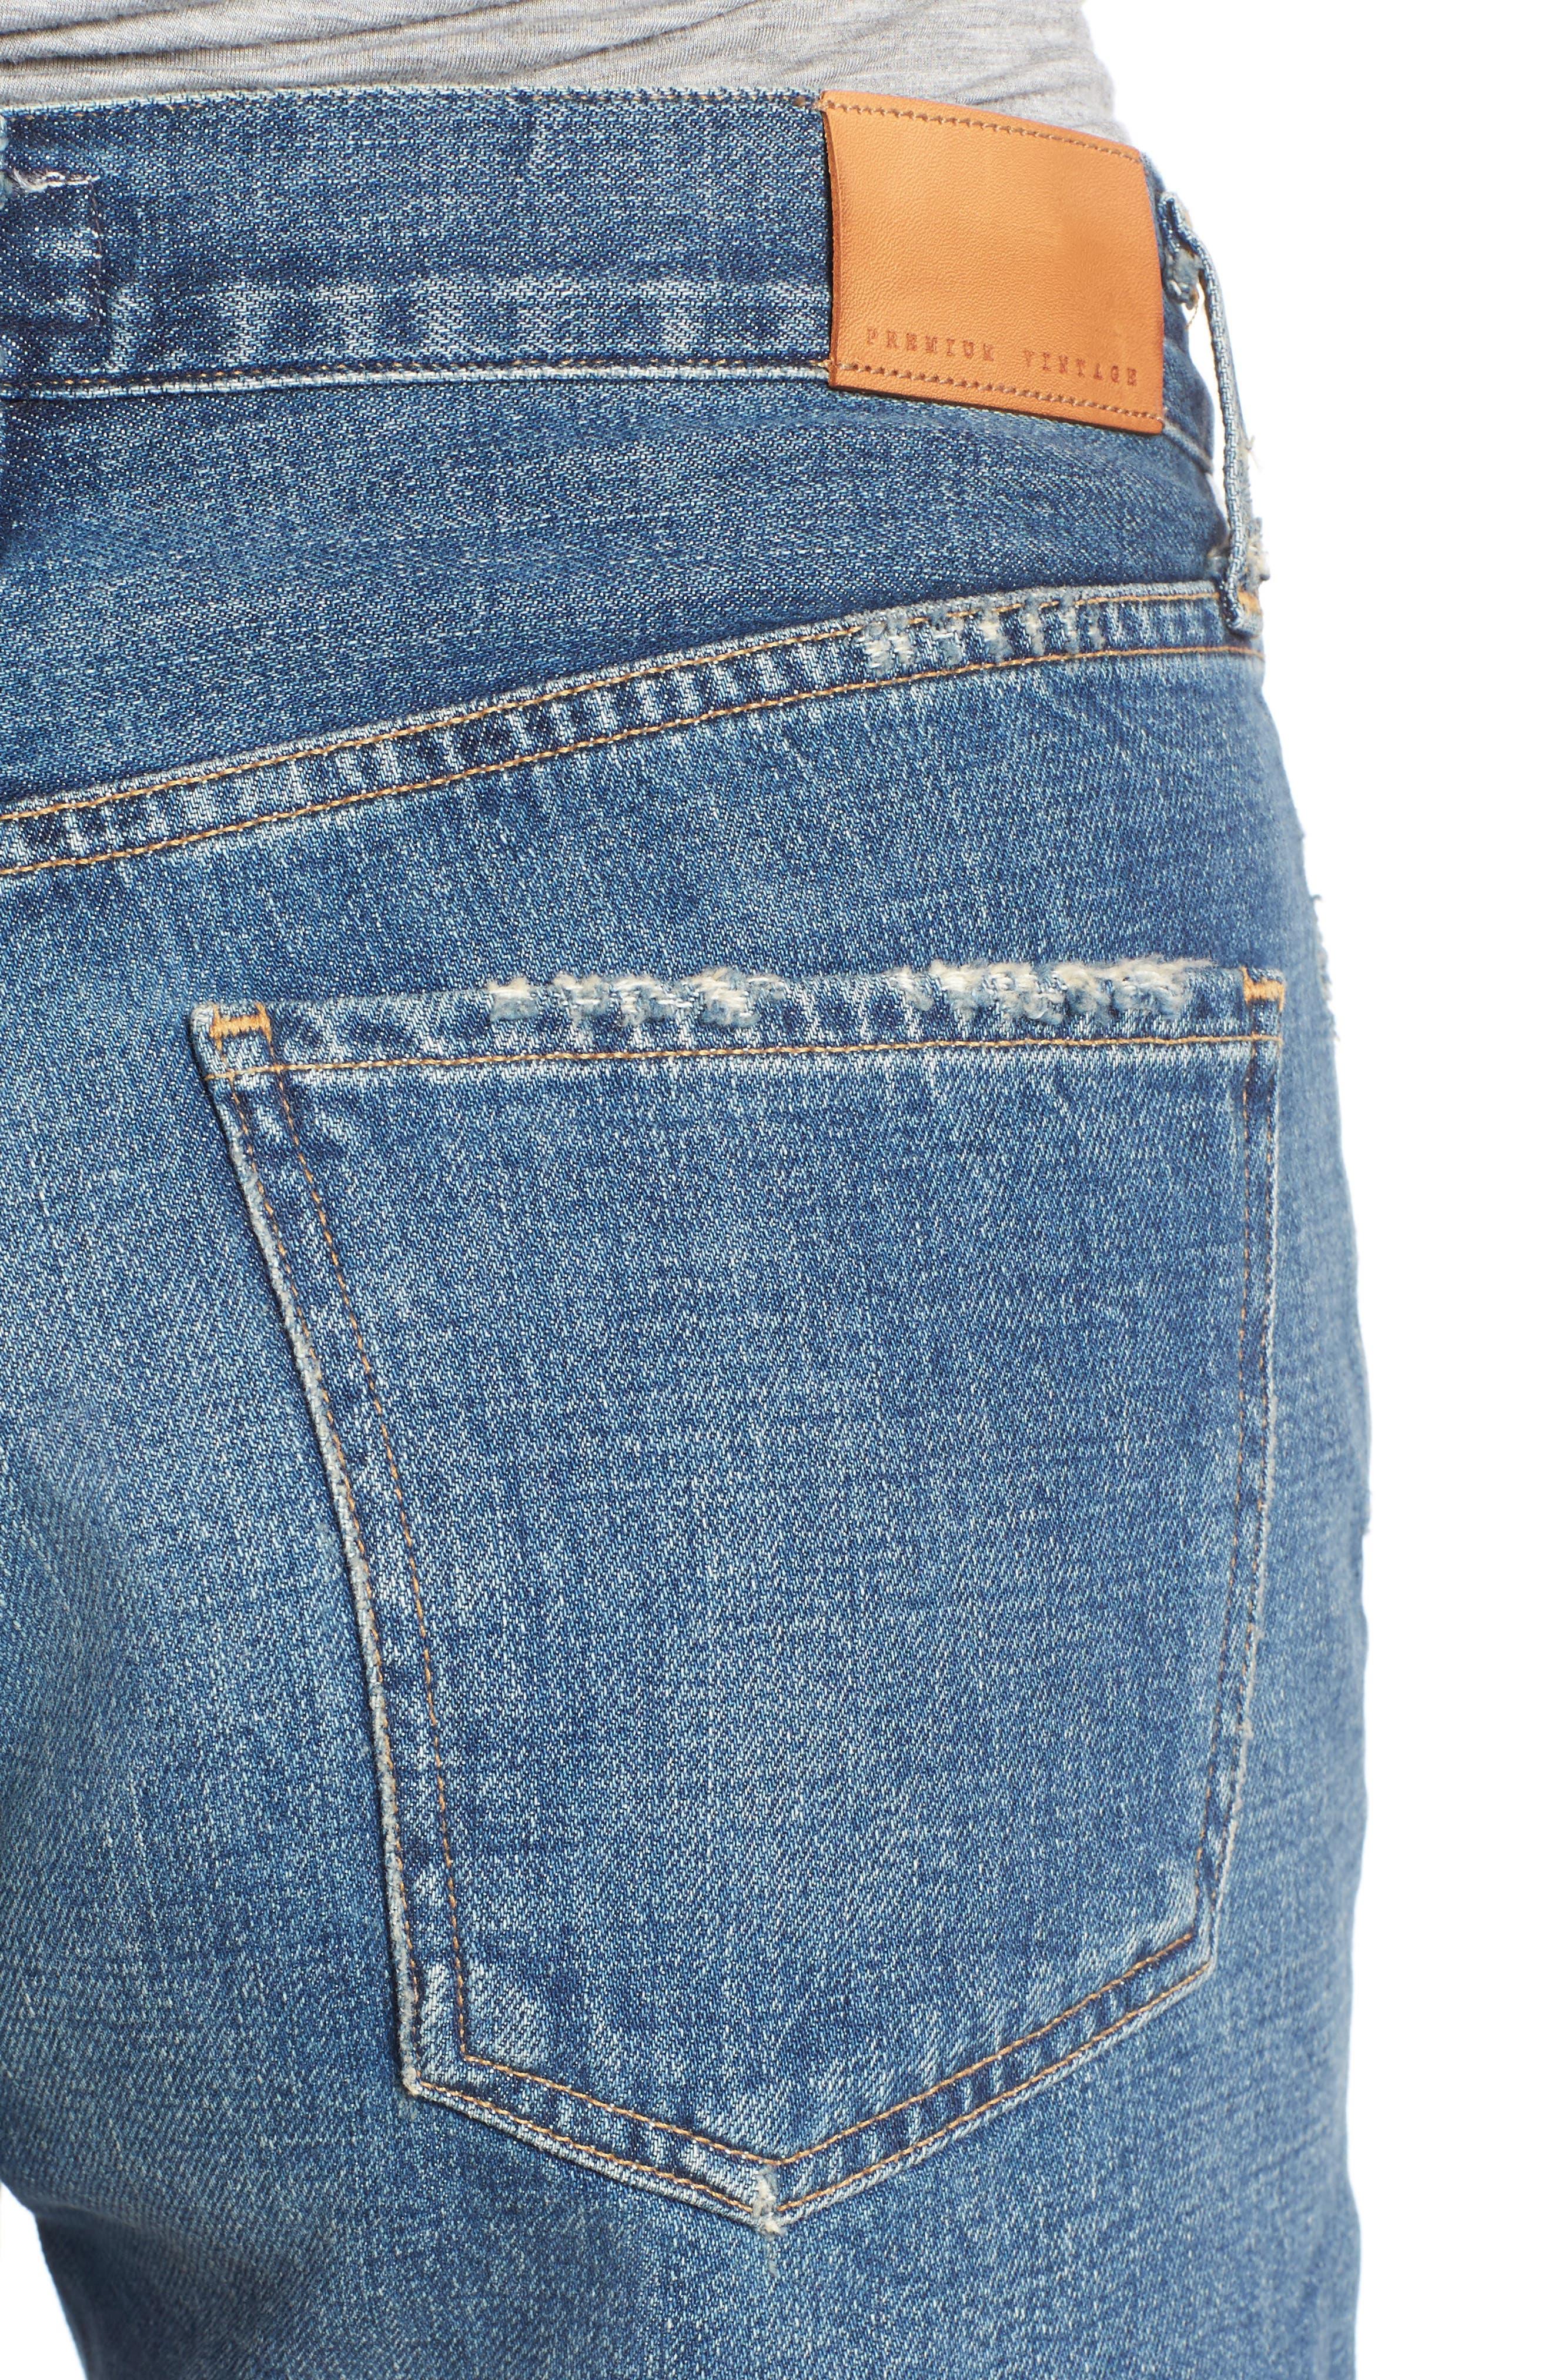 Alyx High Waist Cutoff Denim Shorts,                             Alternate thumbnail 4, color,                             Teaser